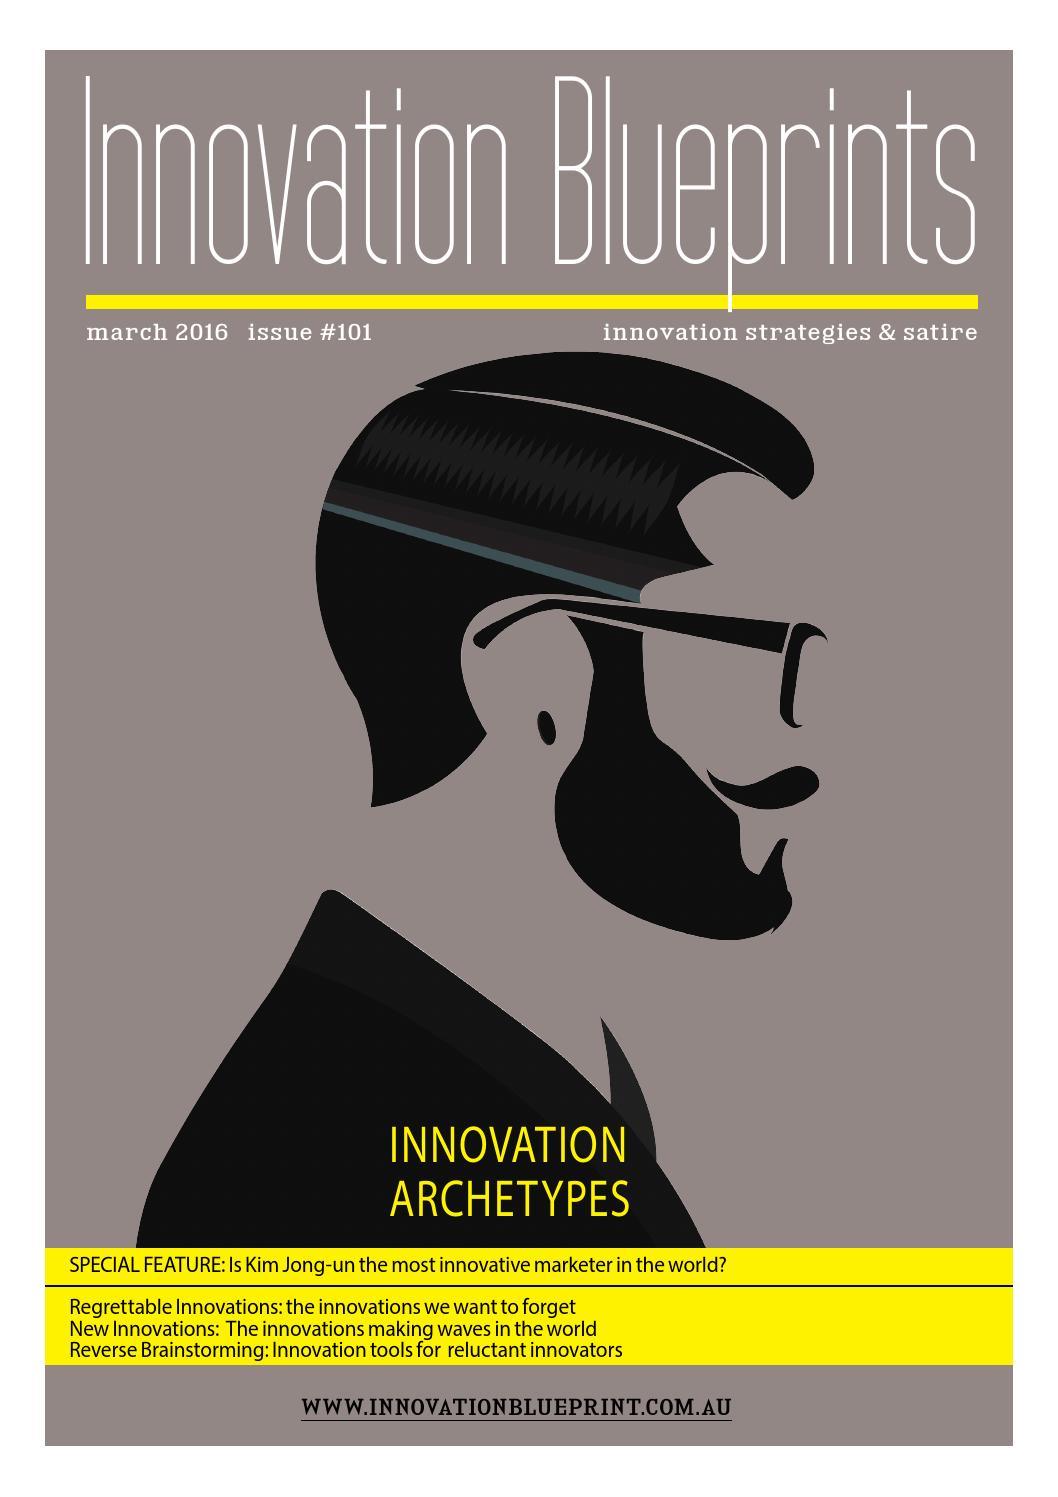 Innovation blueprints 101 by innovation blueprint issuu altavistaventures Gallery